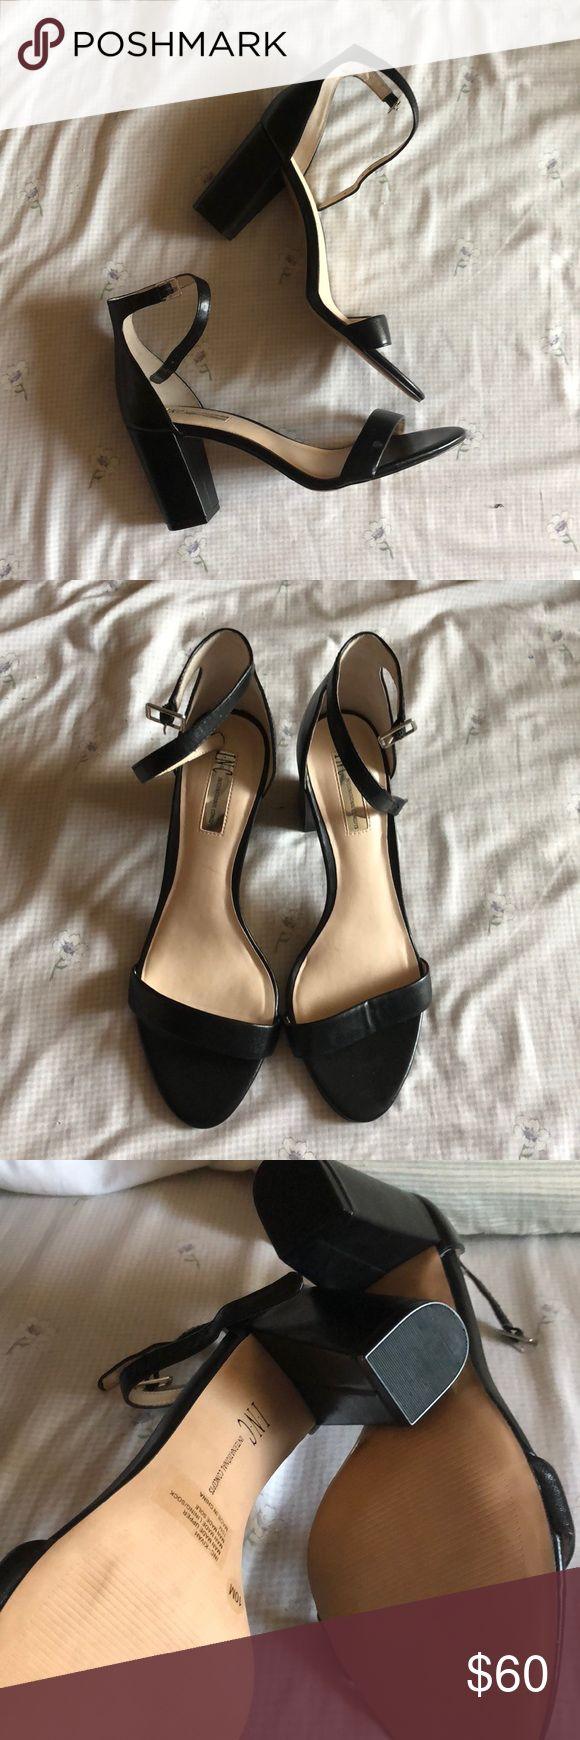 INC Single Sole Heel - Size 10 INC Single Sole Heel - Size 10 Never Worn. Do not have the original box. 3 inch block heel INC International Concepts Shoes Heels